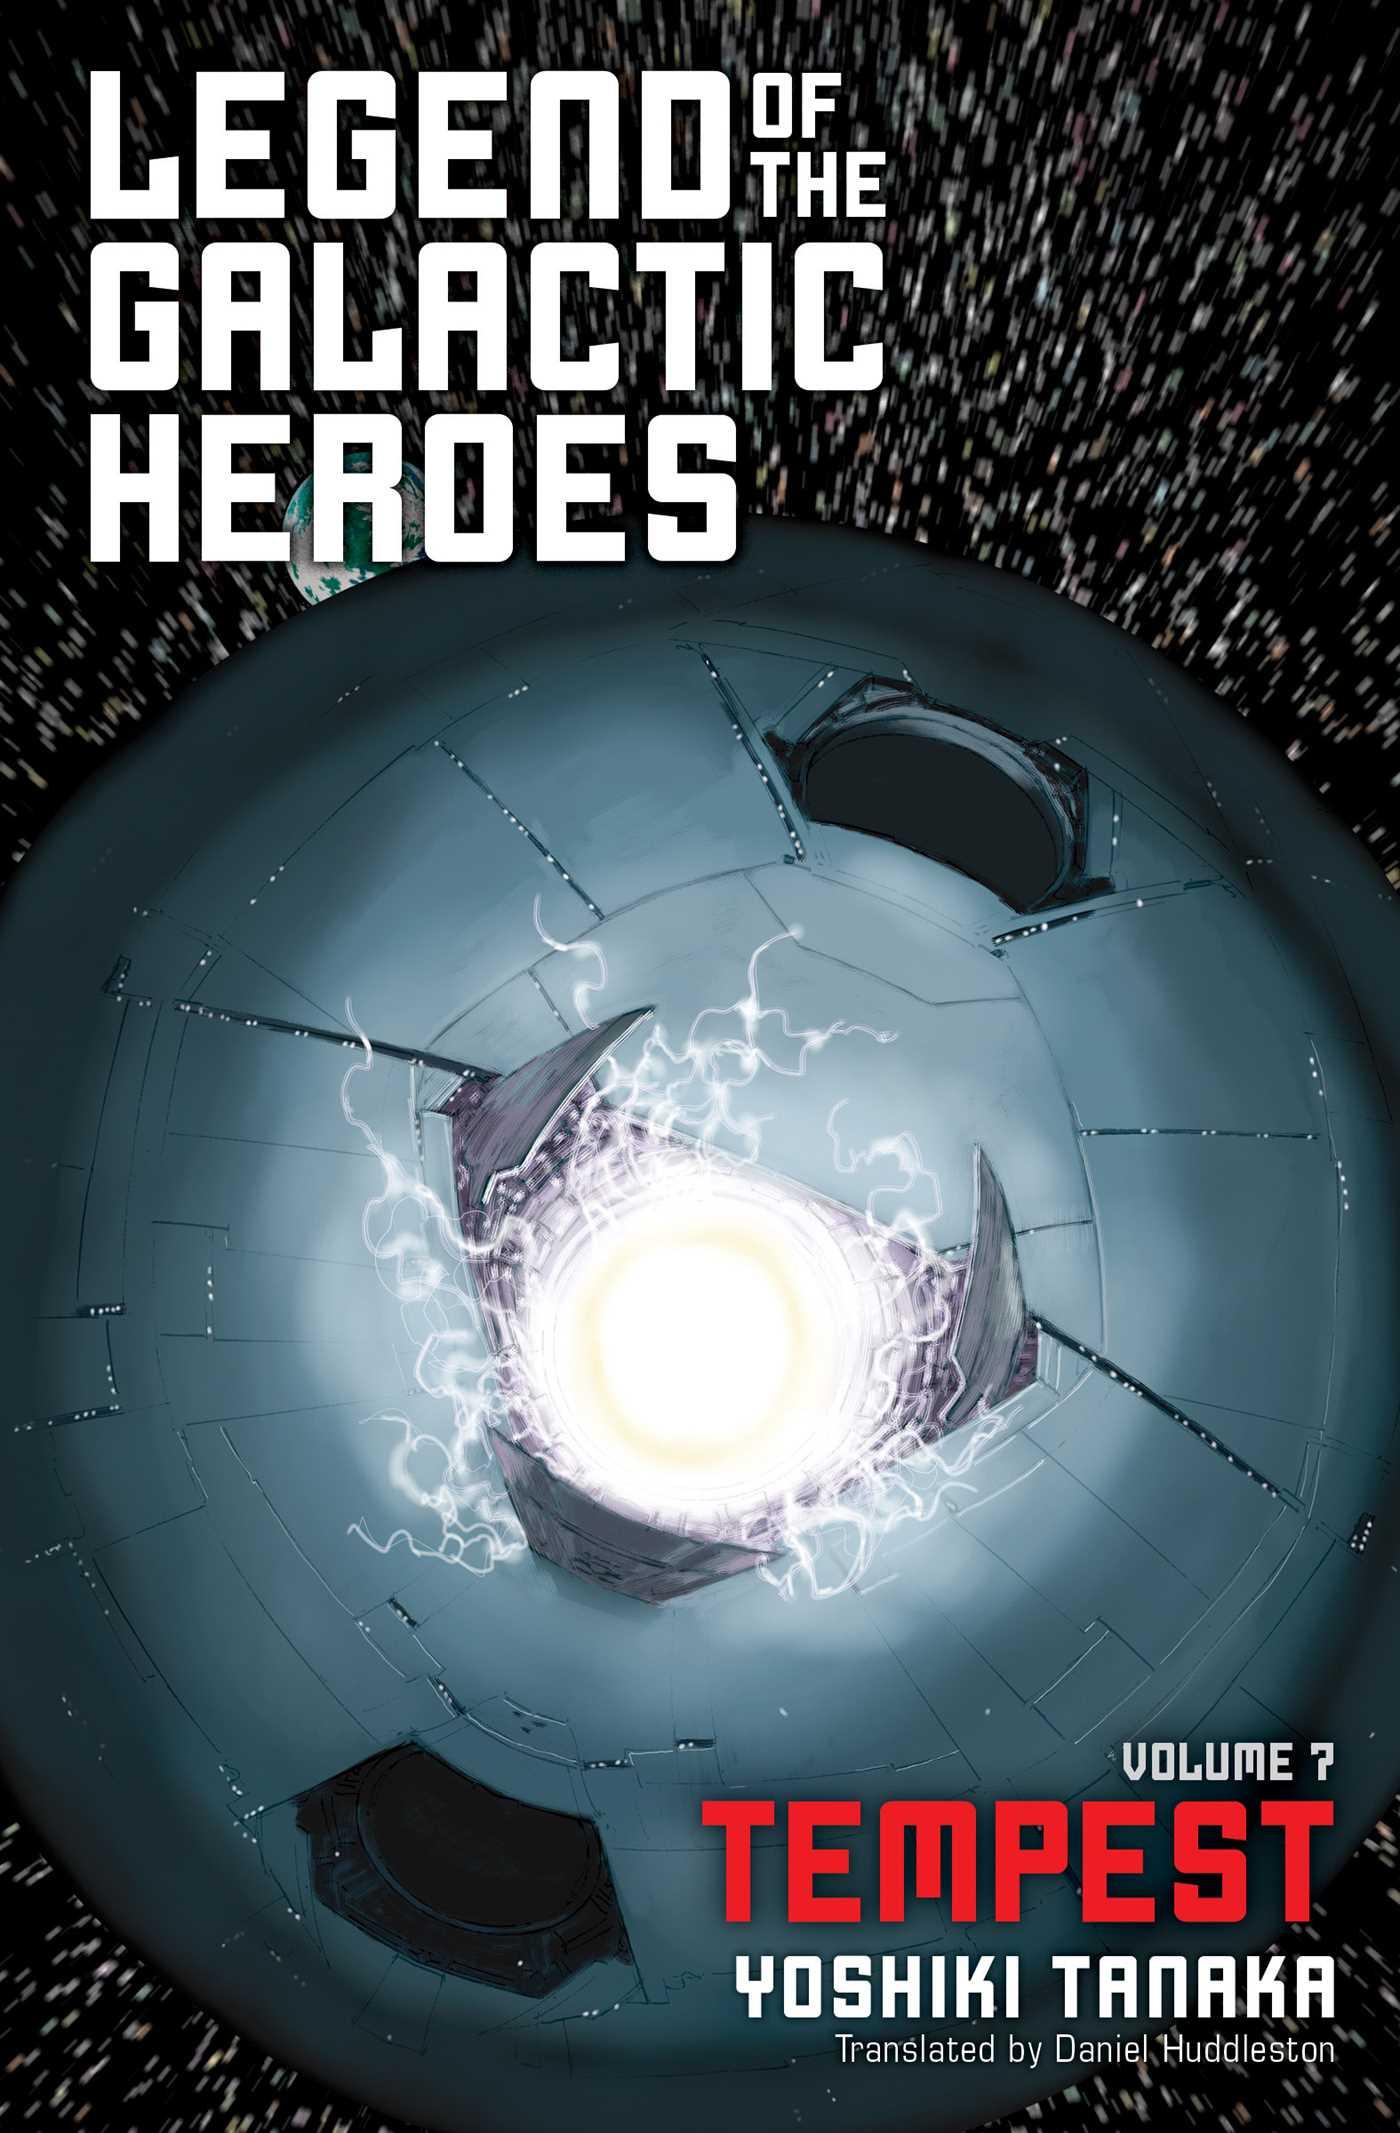 Legend of the galactic heroes vol 7 9781421585291 hr